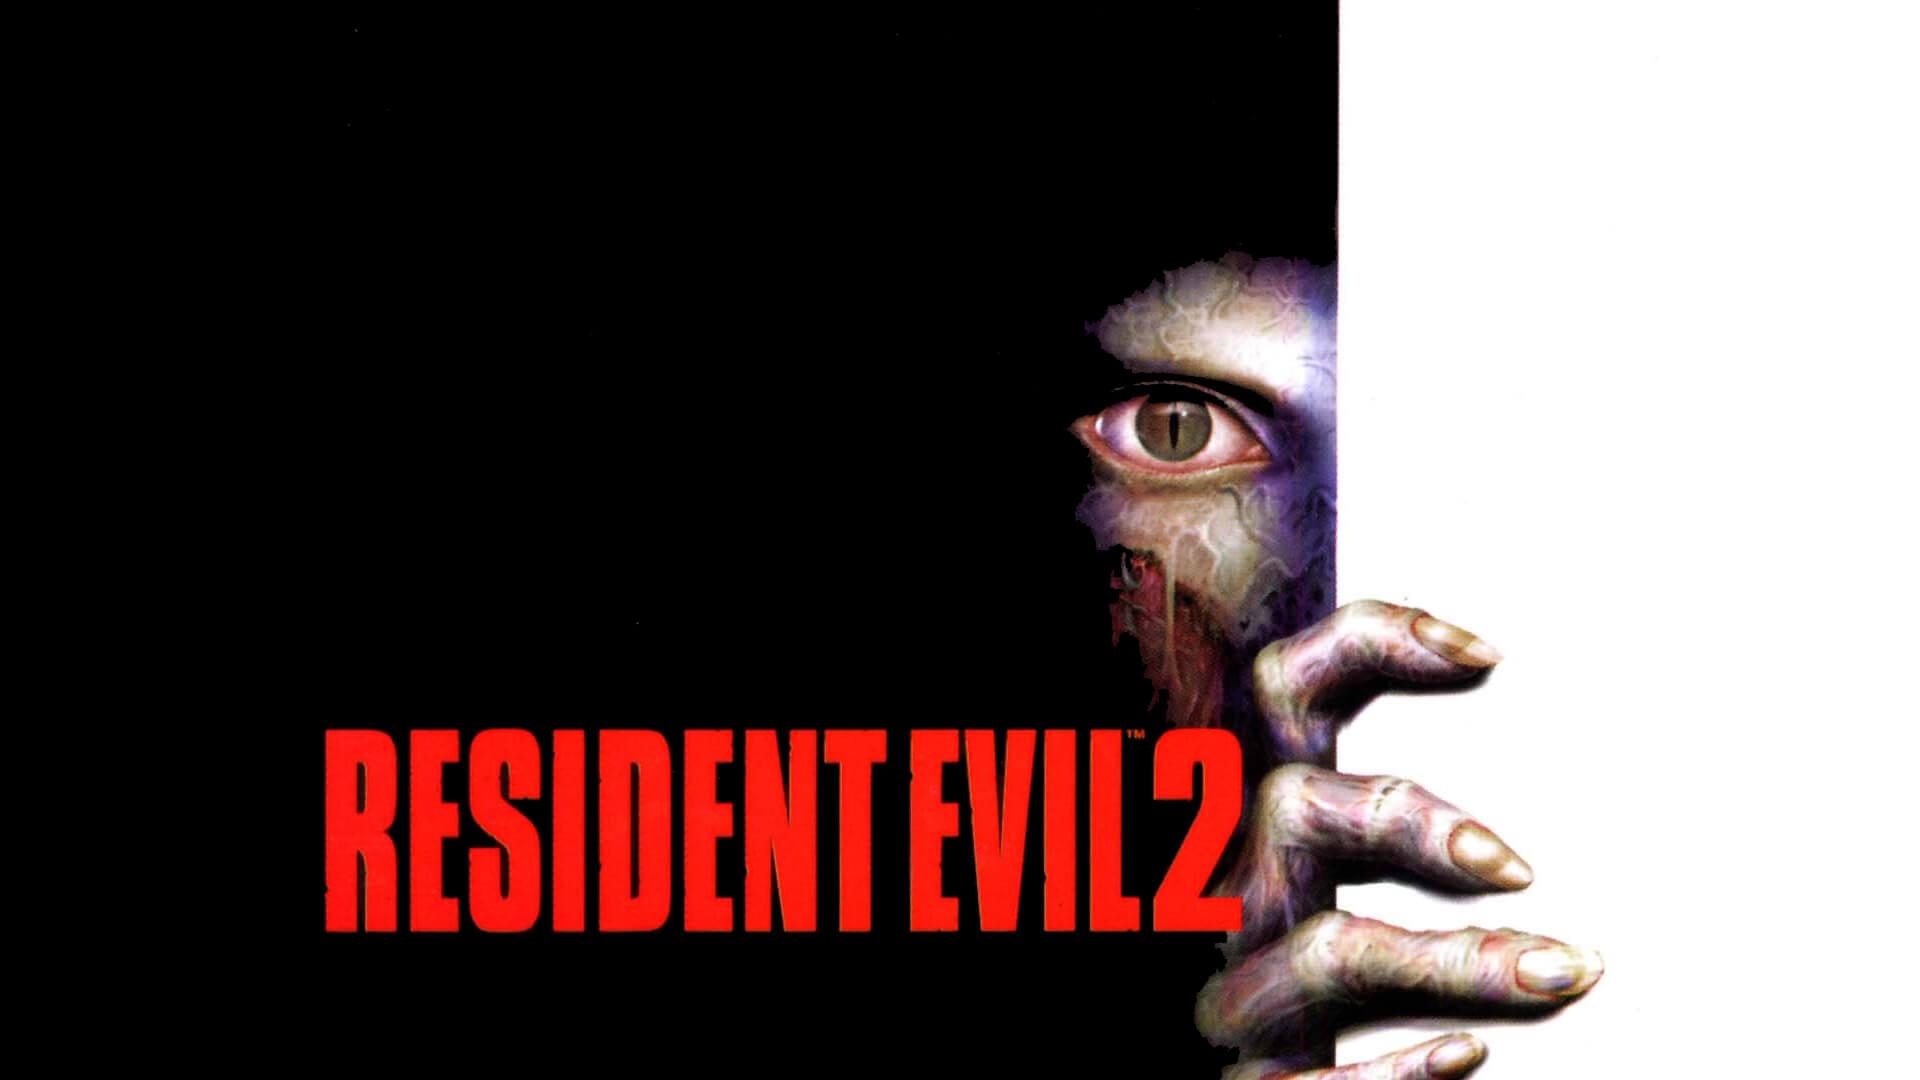 red jewel, resident evil 2